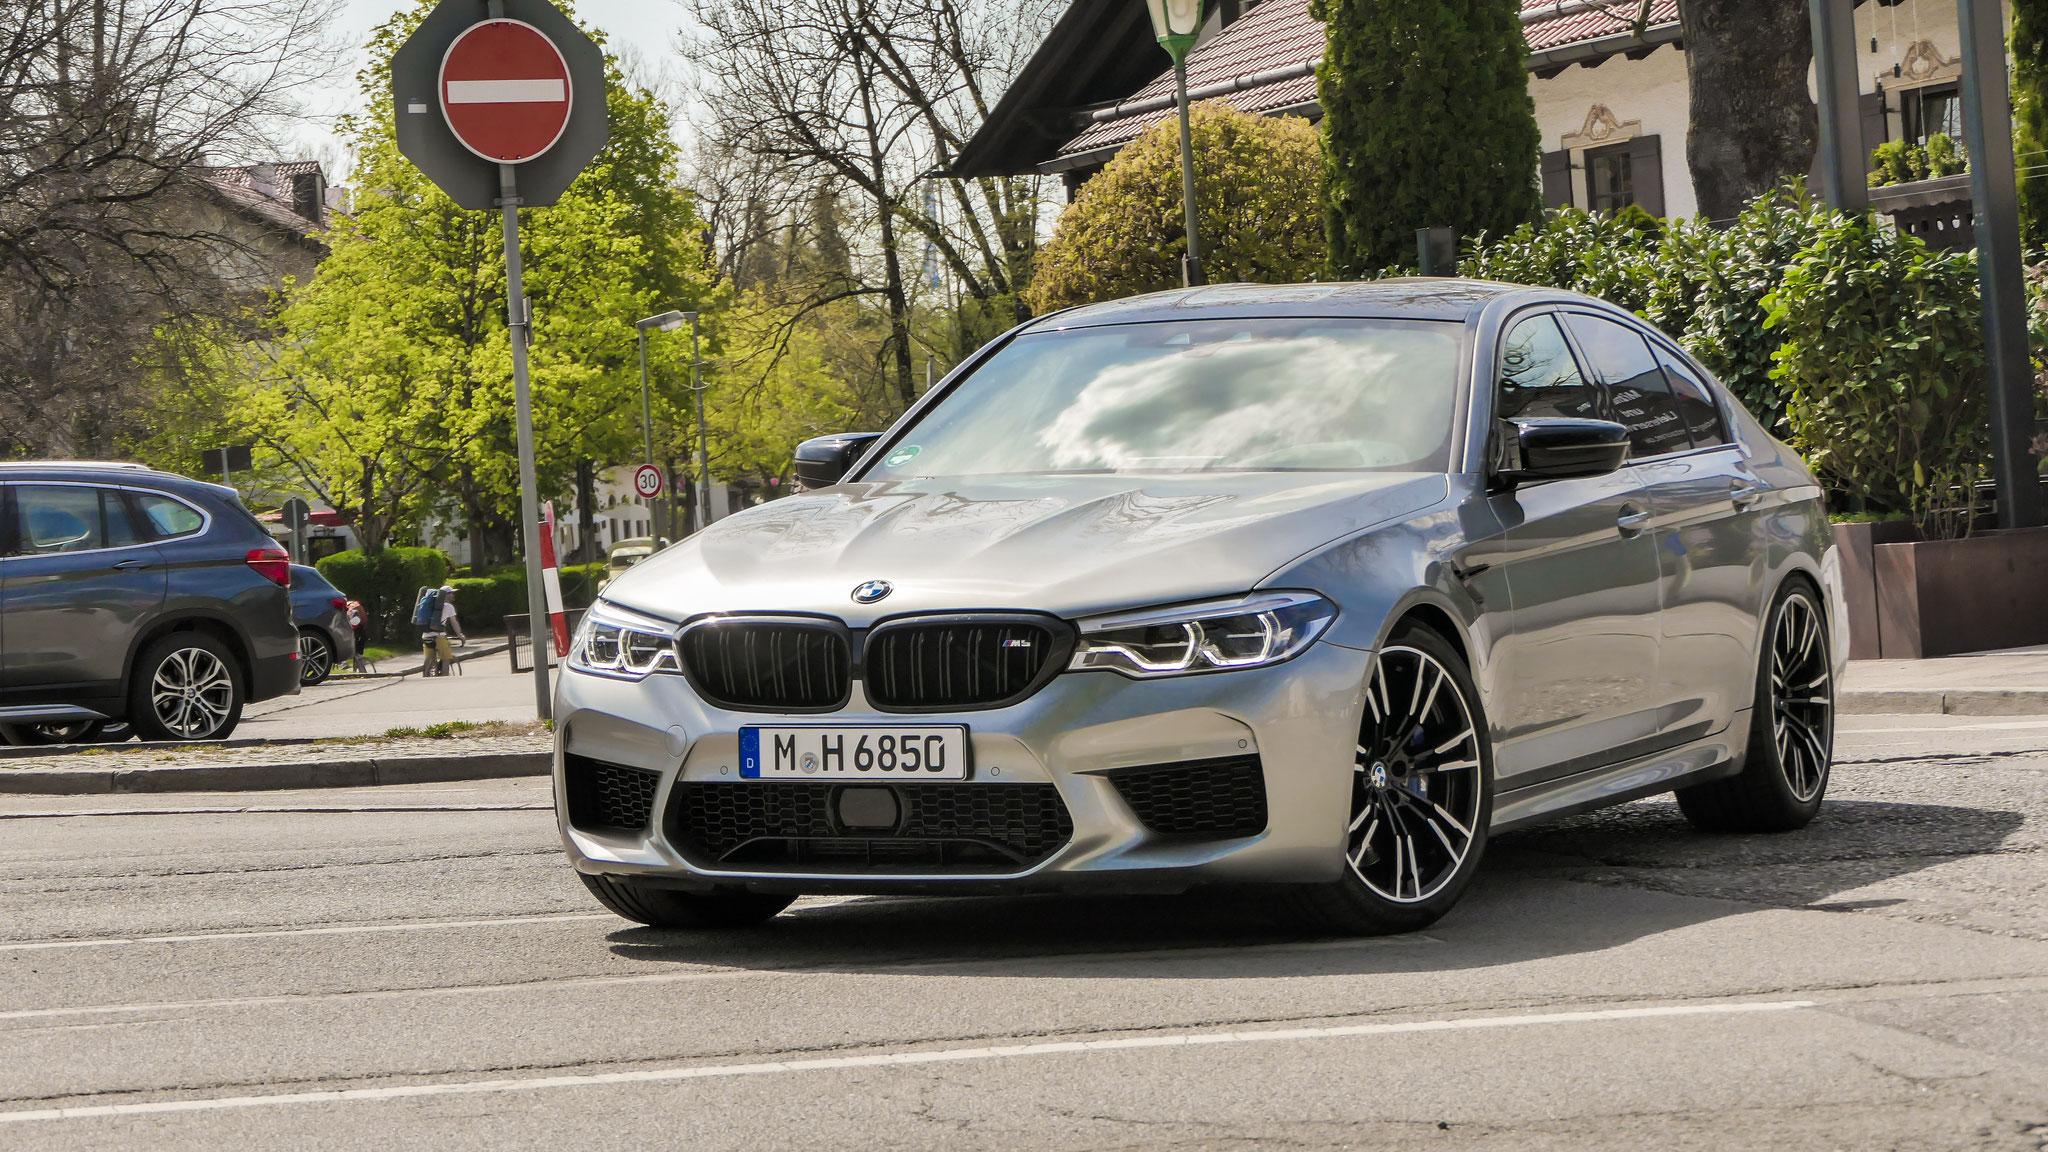 BMW M5 - M-H-6850